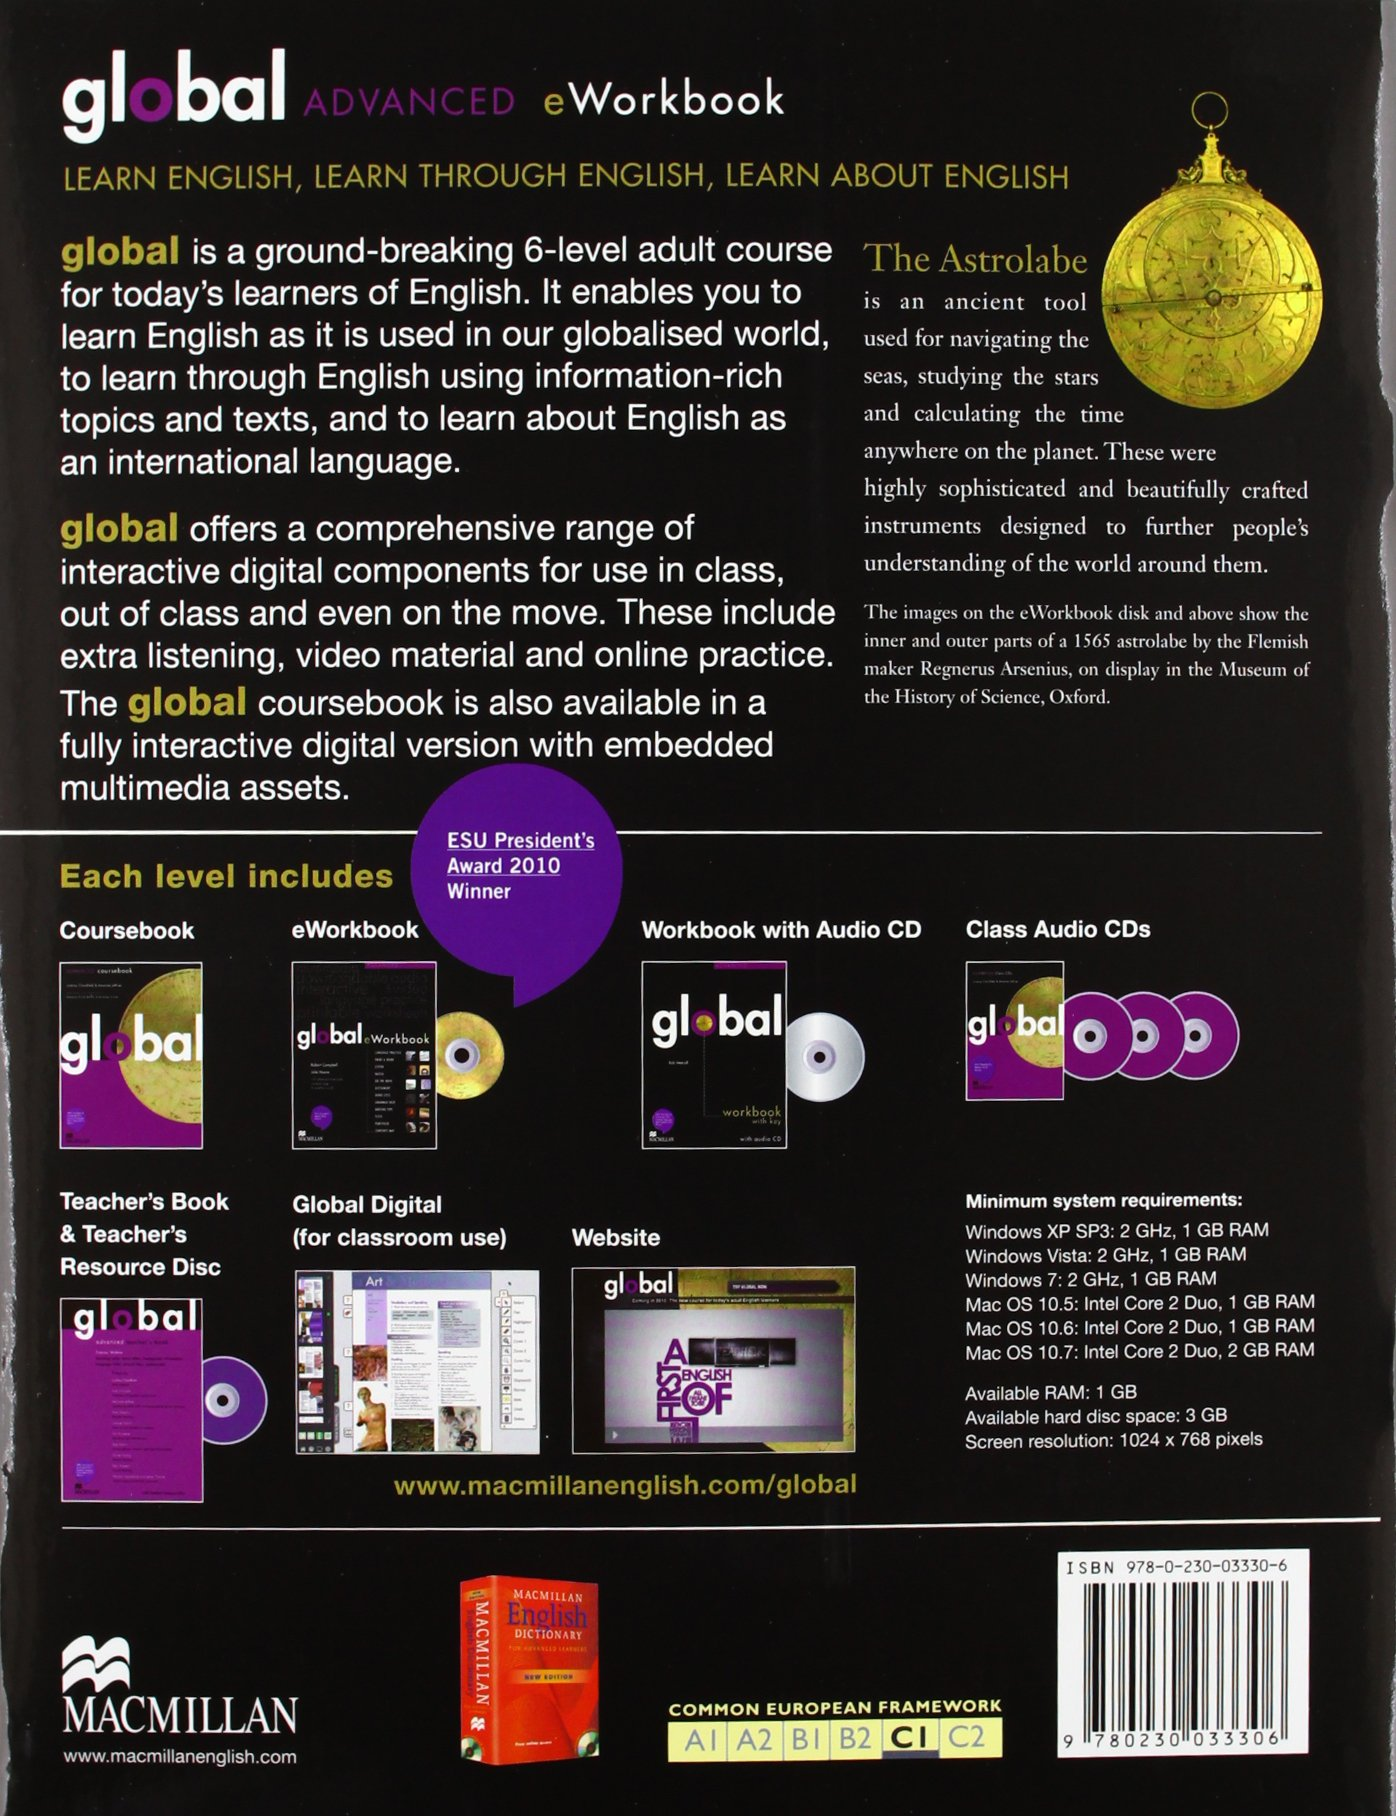 Global advanced coursebook with eworkbook pack lindsay clandfield global advanced coursebook with eworkbook pack lindsay clandfield 9780230033306 amazon books fandeluxe Gallery